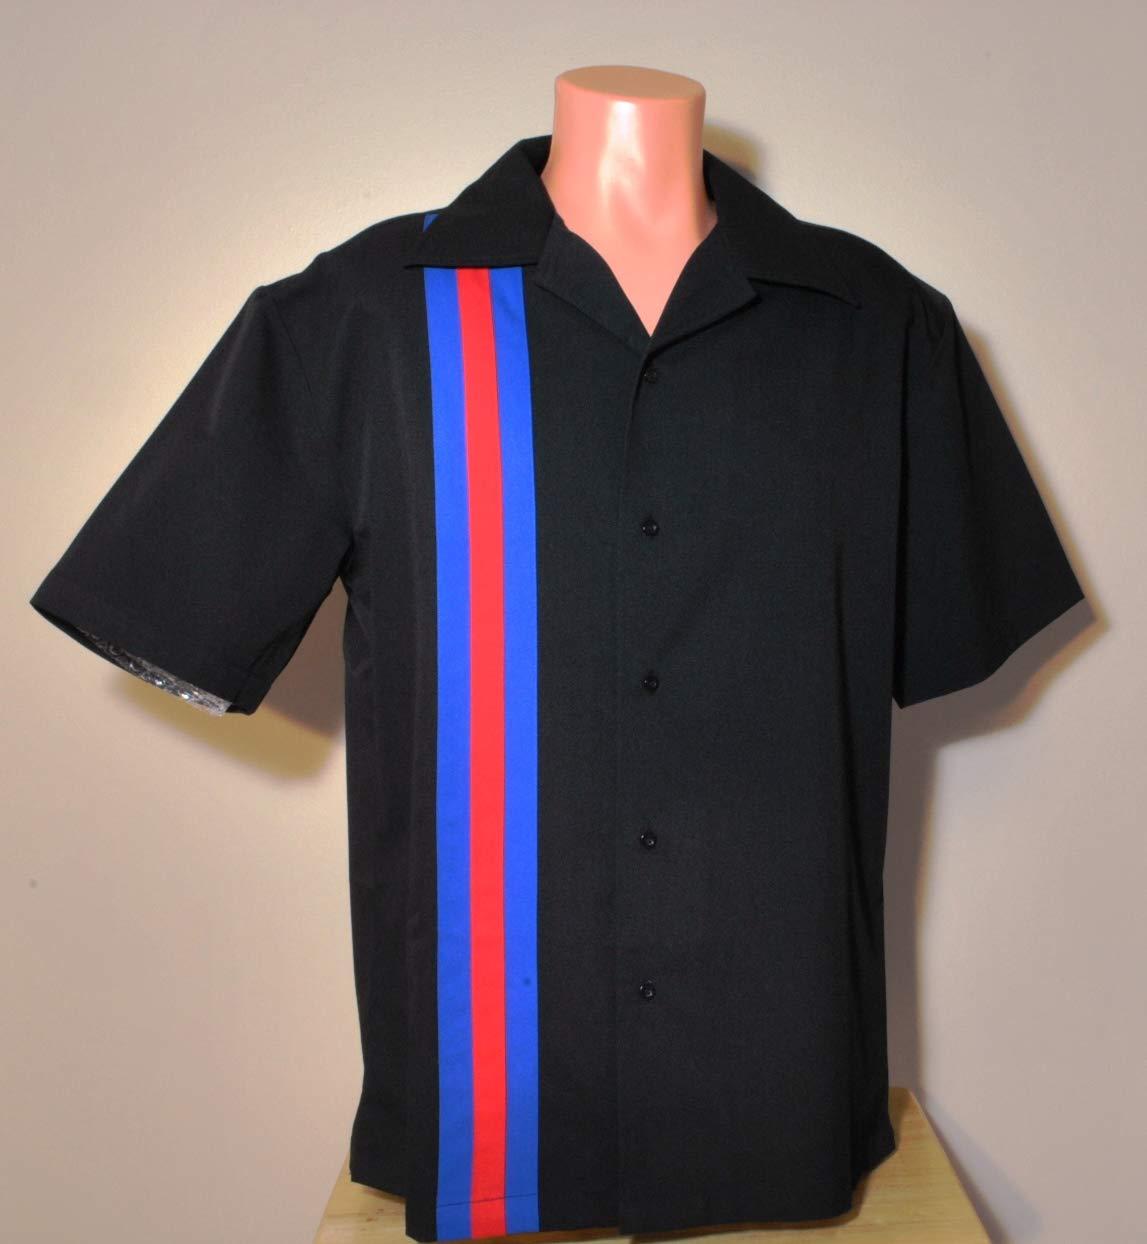 Designs by Attila Mens Leisure Bowling Shirt, 50's Style. Size 2XLT Tall USMC by Designs by Attila